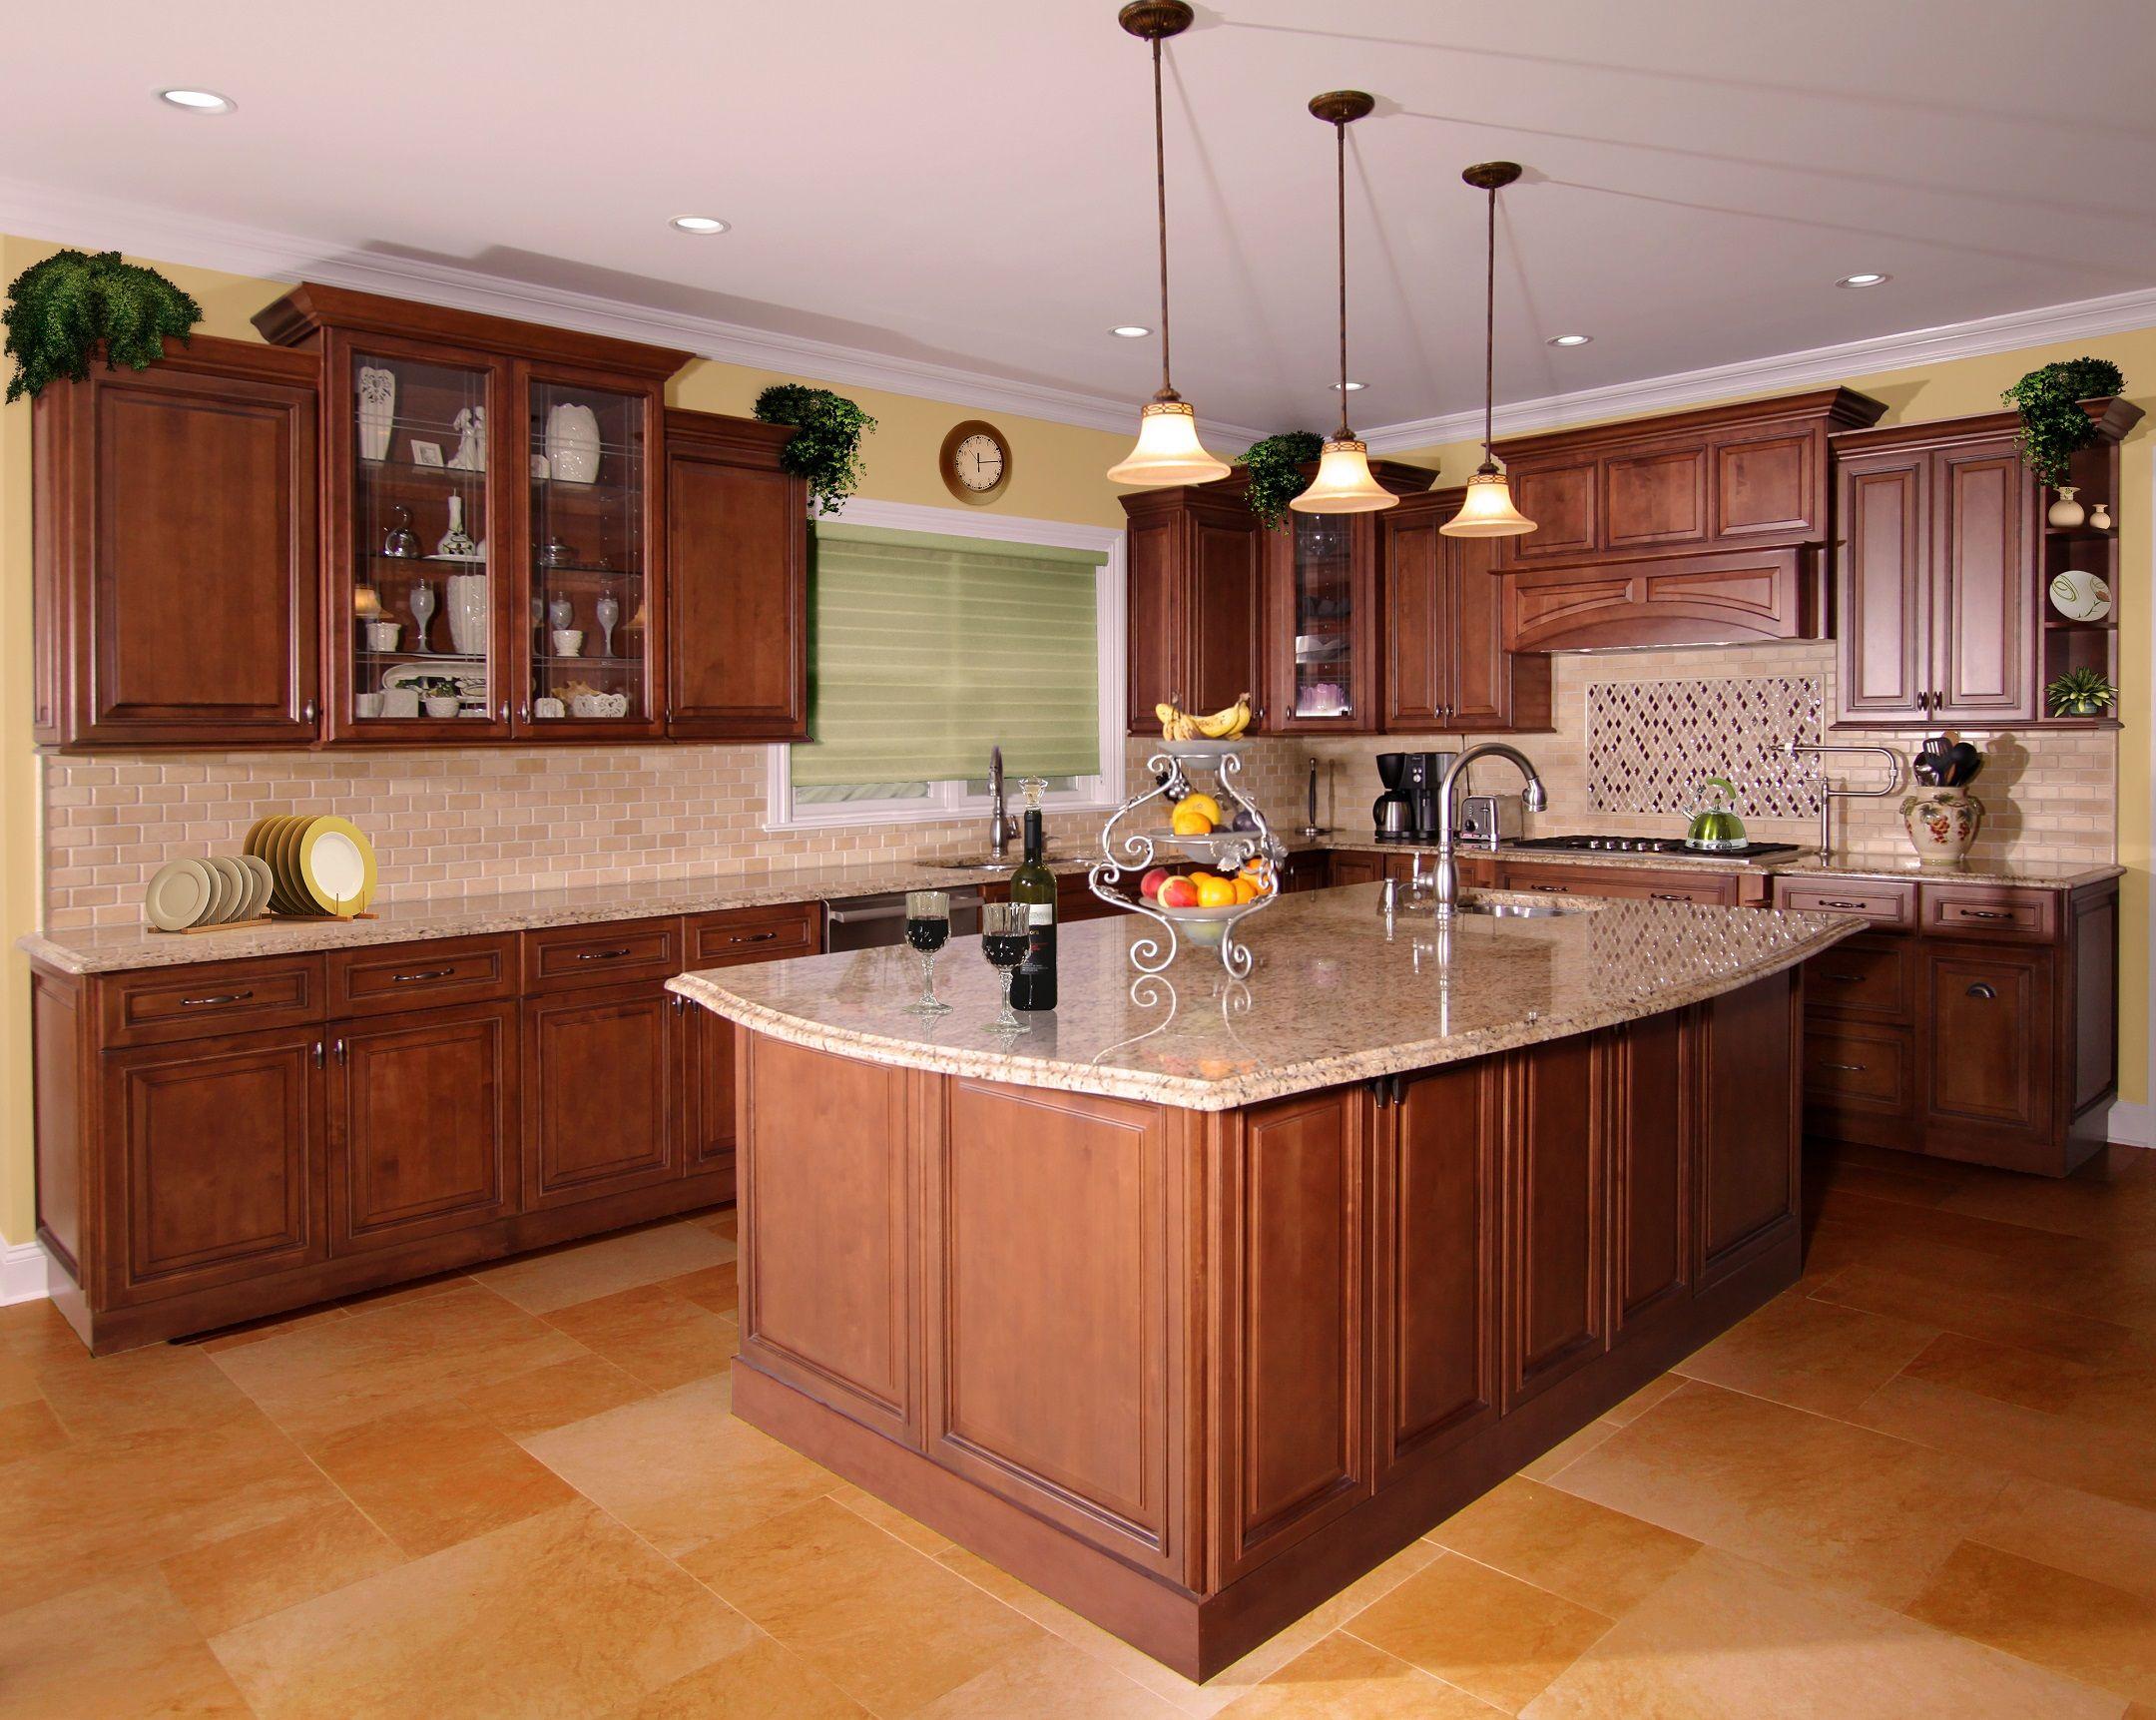 Wellington Cinnamon Kitchen Vanity Kitchen Interior Kitchen Remodel Traditional Kitchen Cabinets